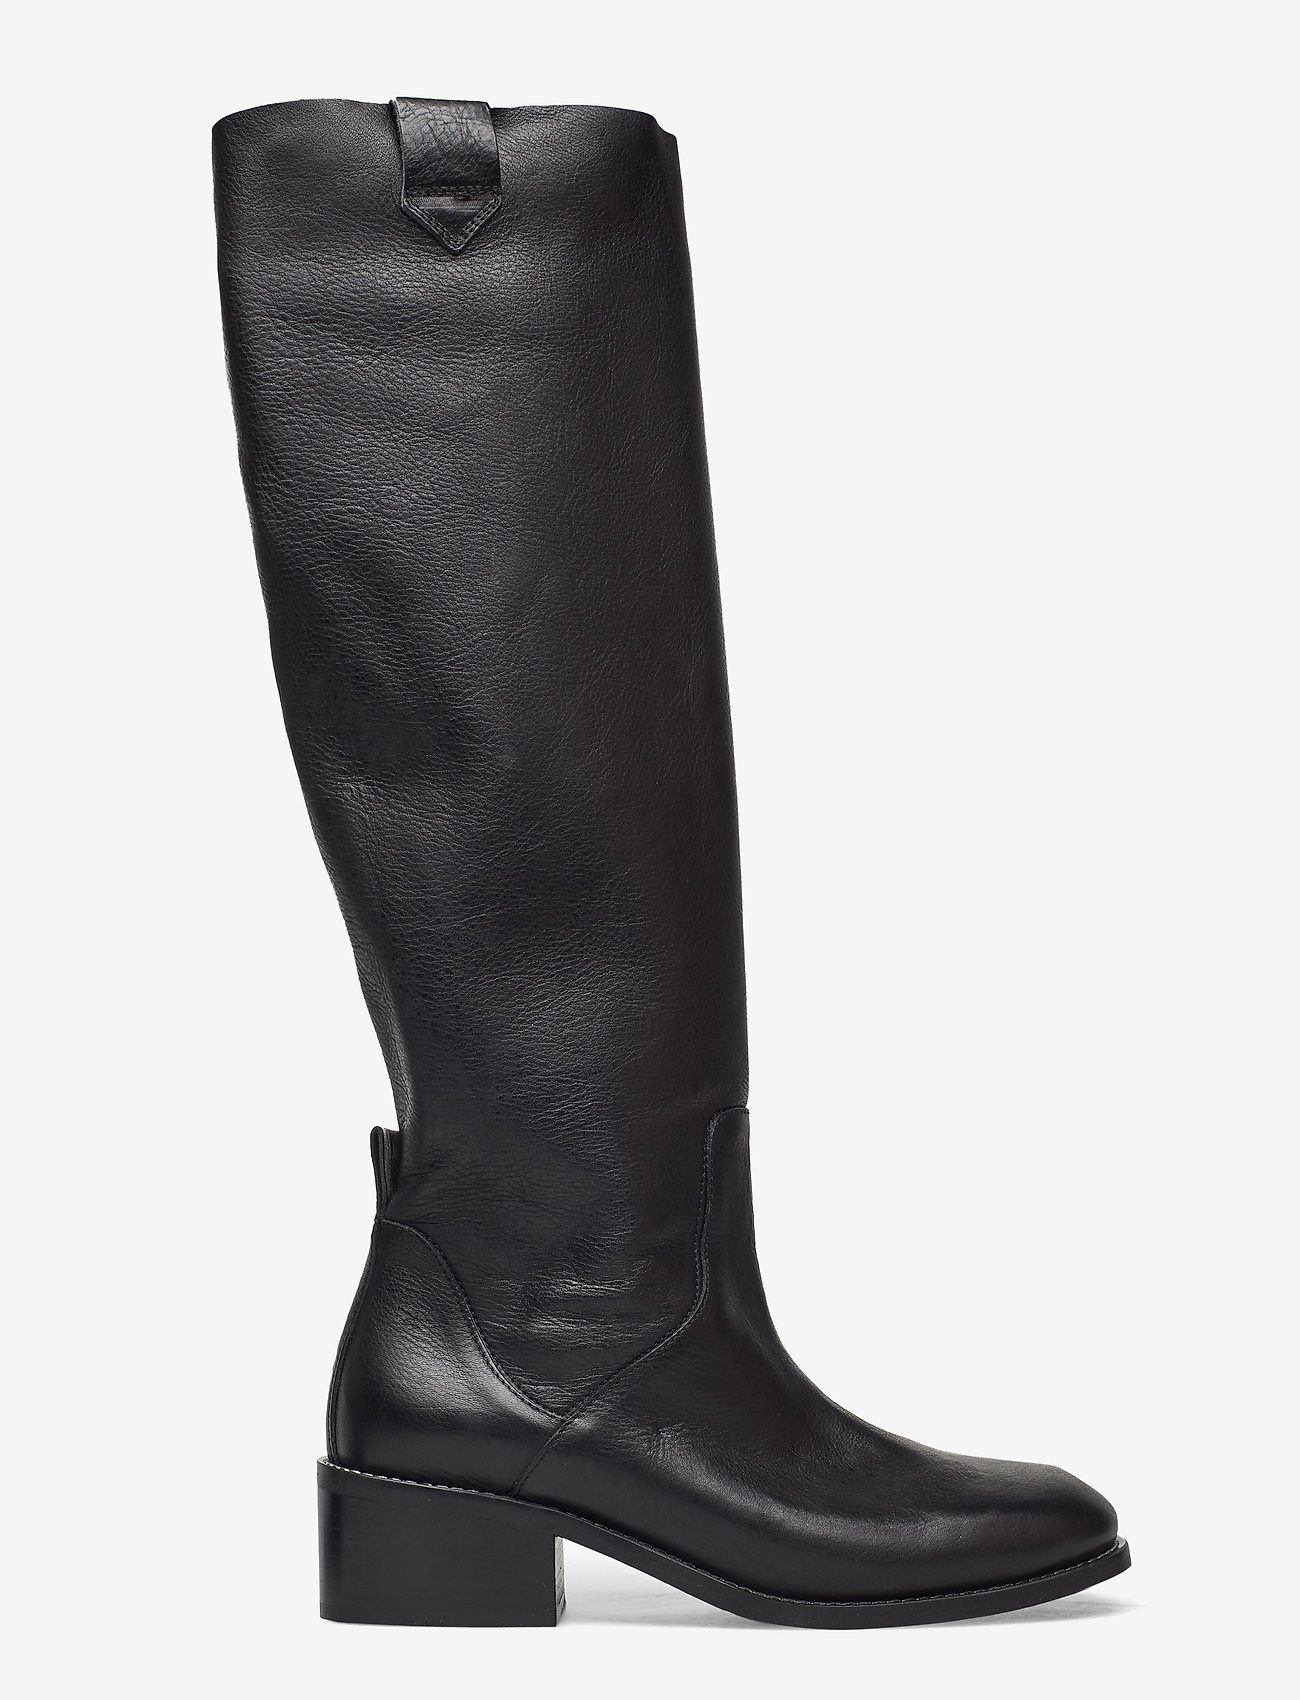 Nude of Scandinavia - SARA - lange laarzen - saratoga/nero - 1